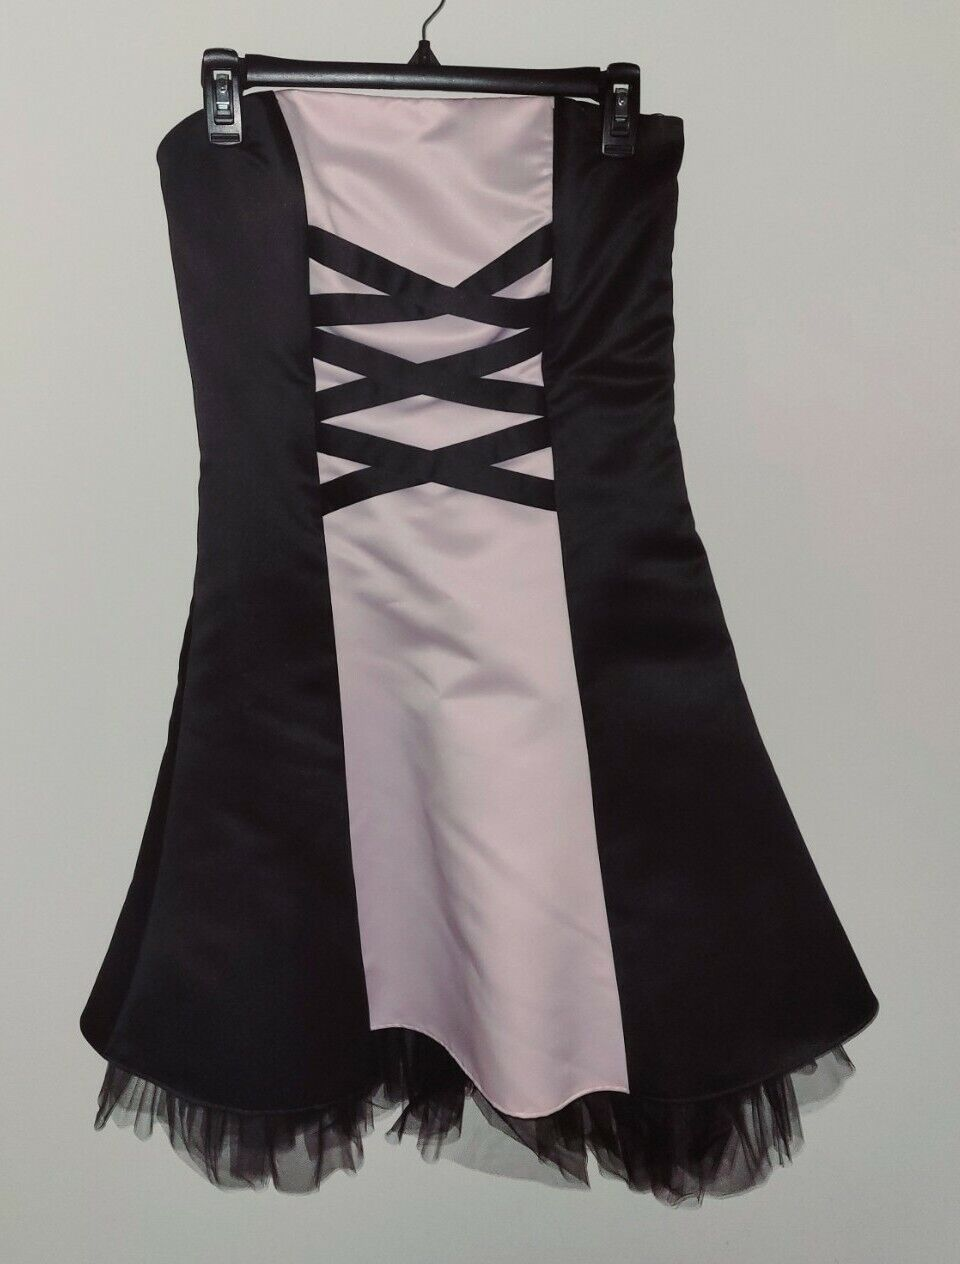 Jessica McClintock for Gunne Sax Tuxedo Dress - image 1